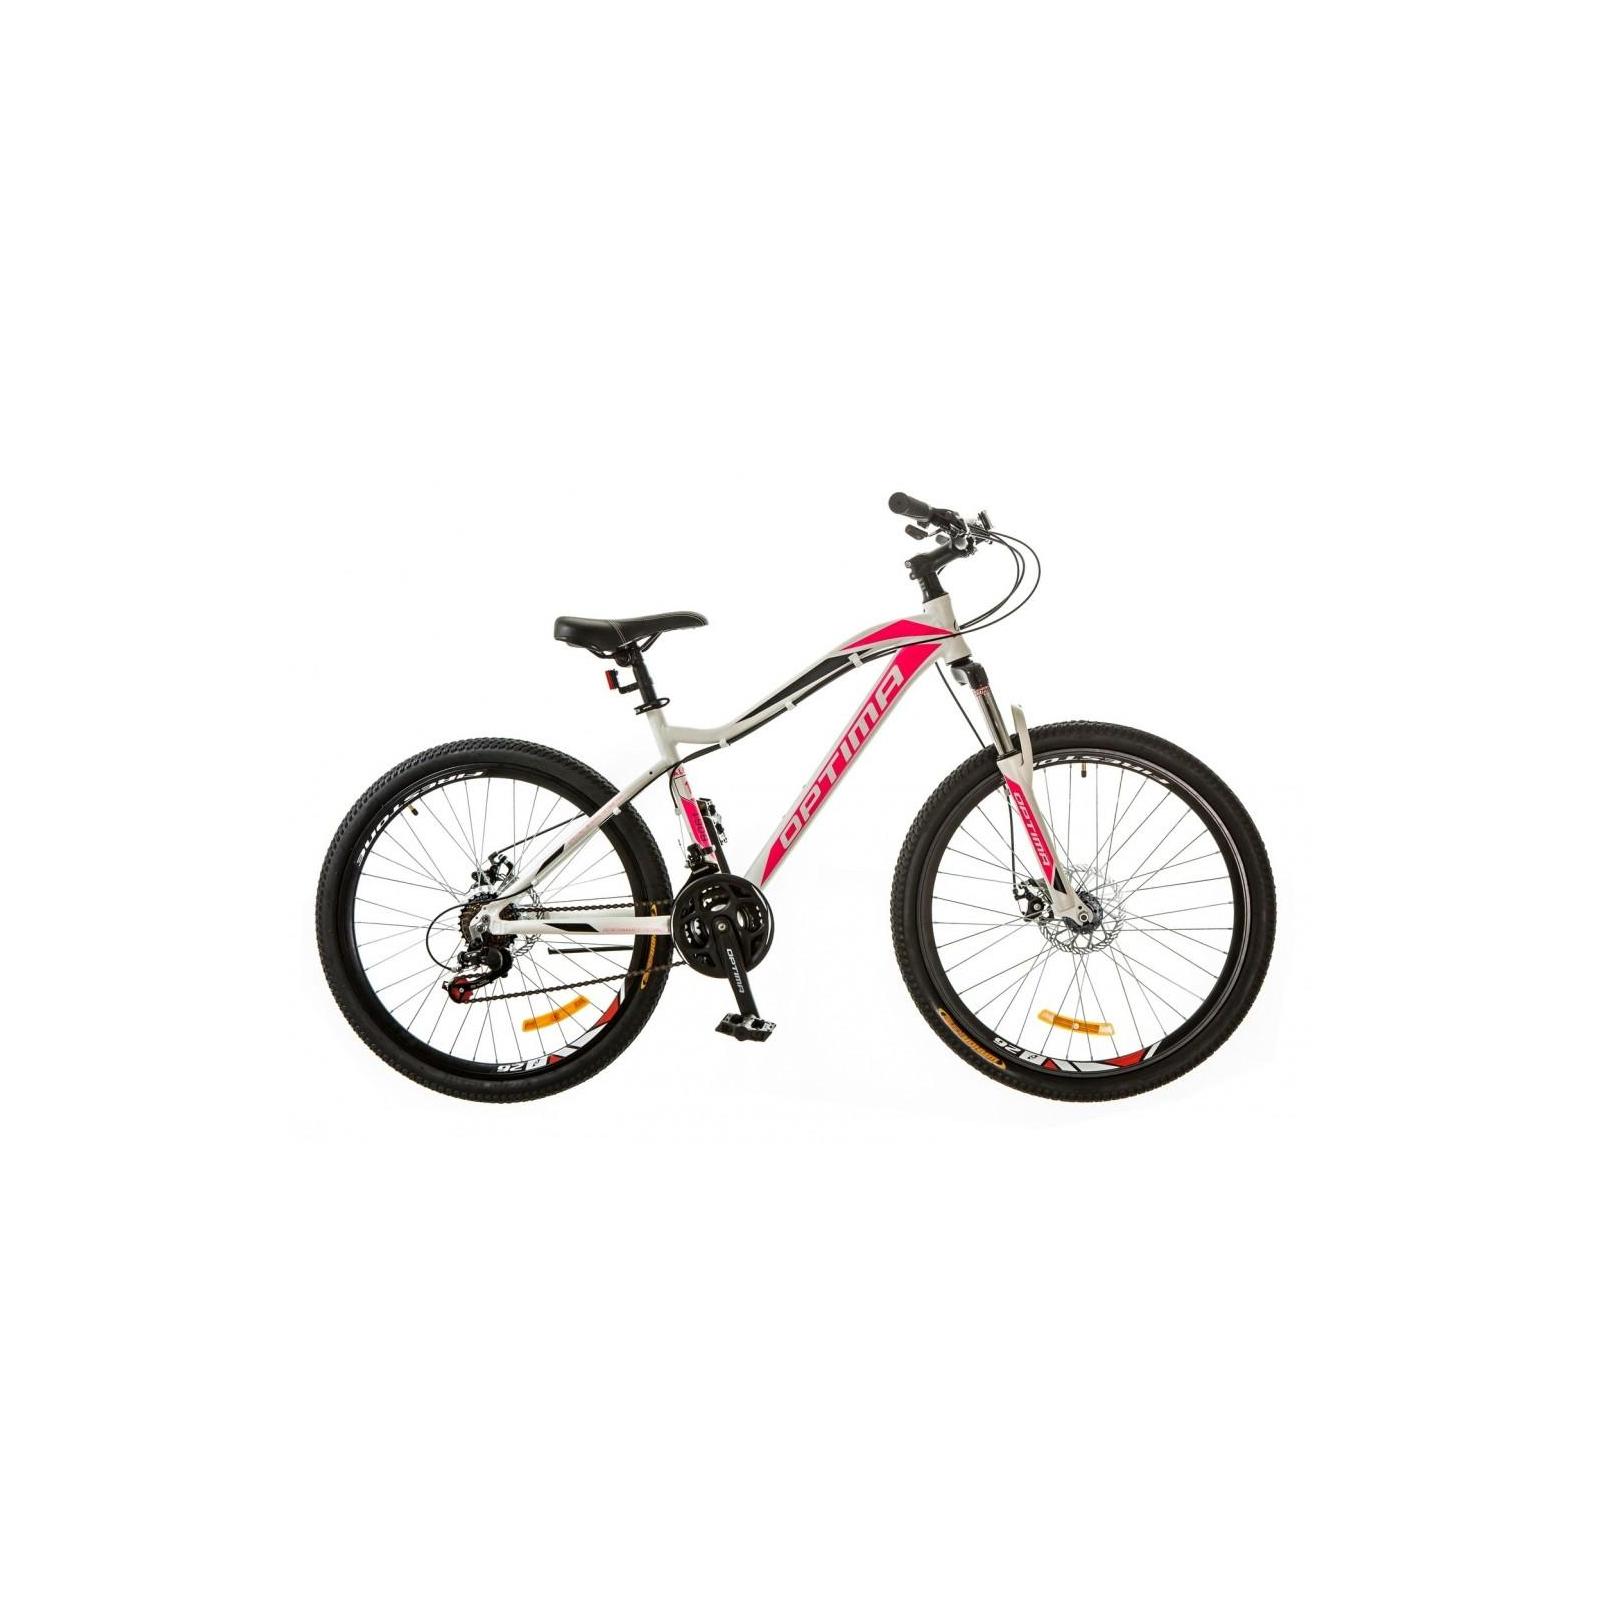 "Велосипед Optimabikes 26"" ALPINA 2018 AM 14G DD рама-16"" Al бело-розовый (OPS-OP-26-105)"